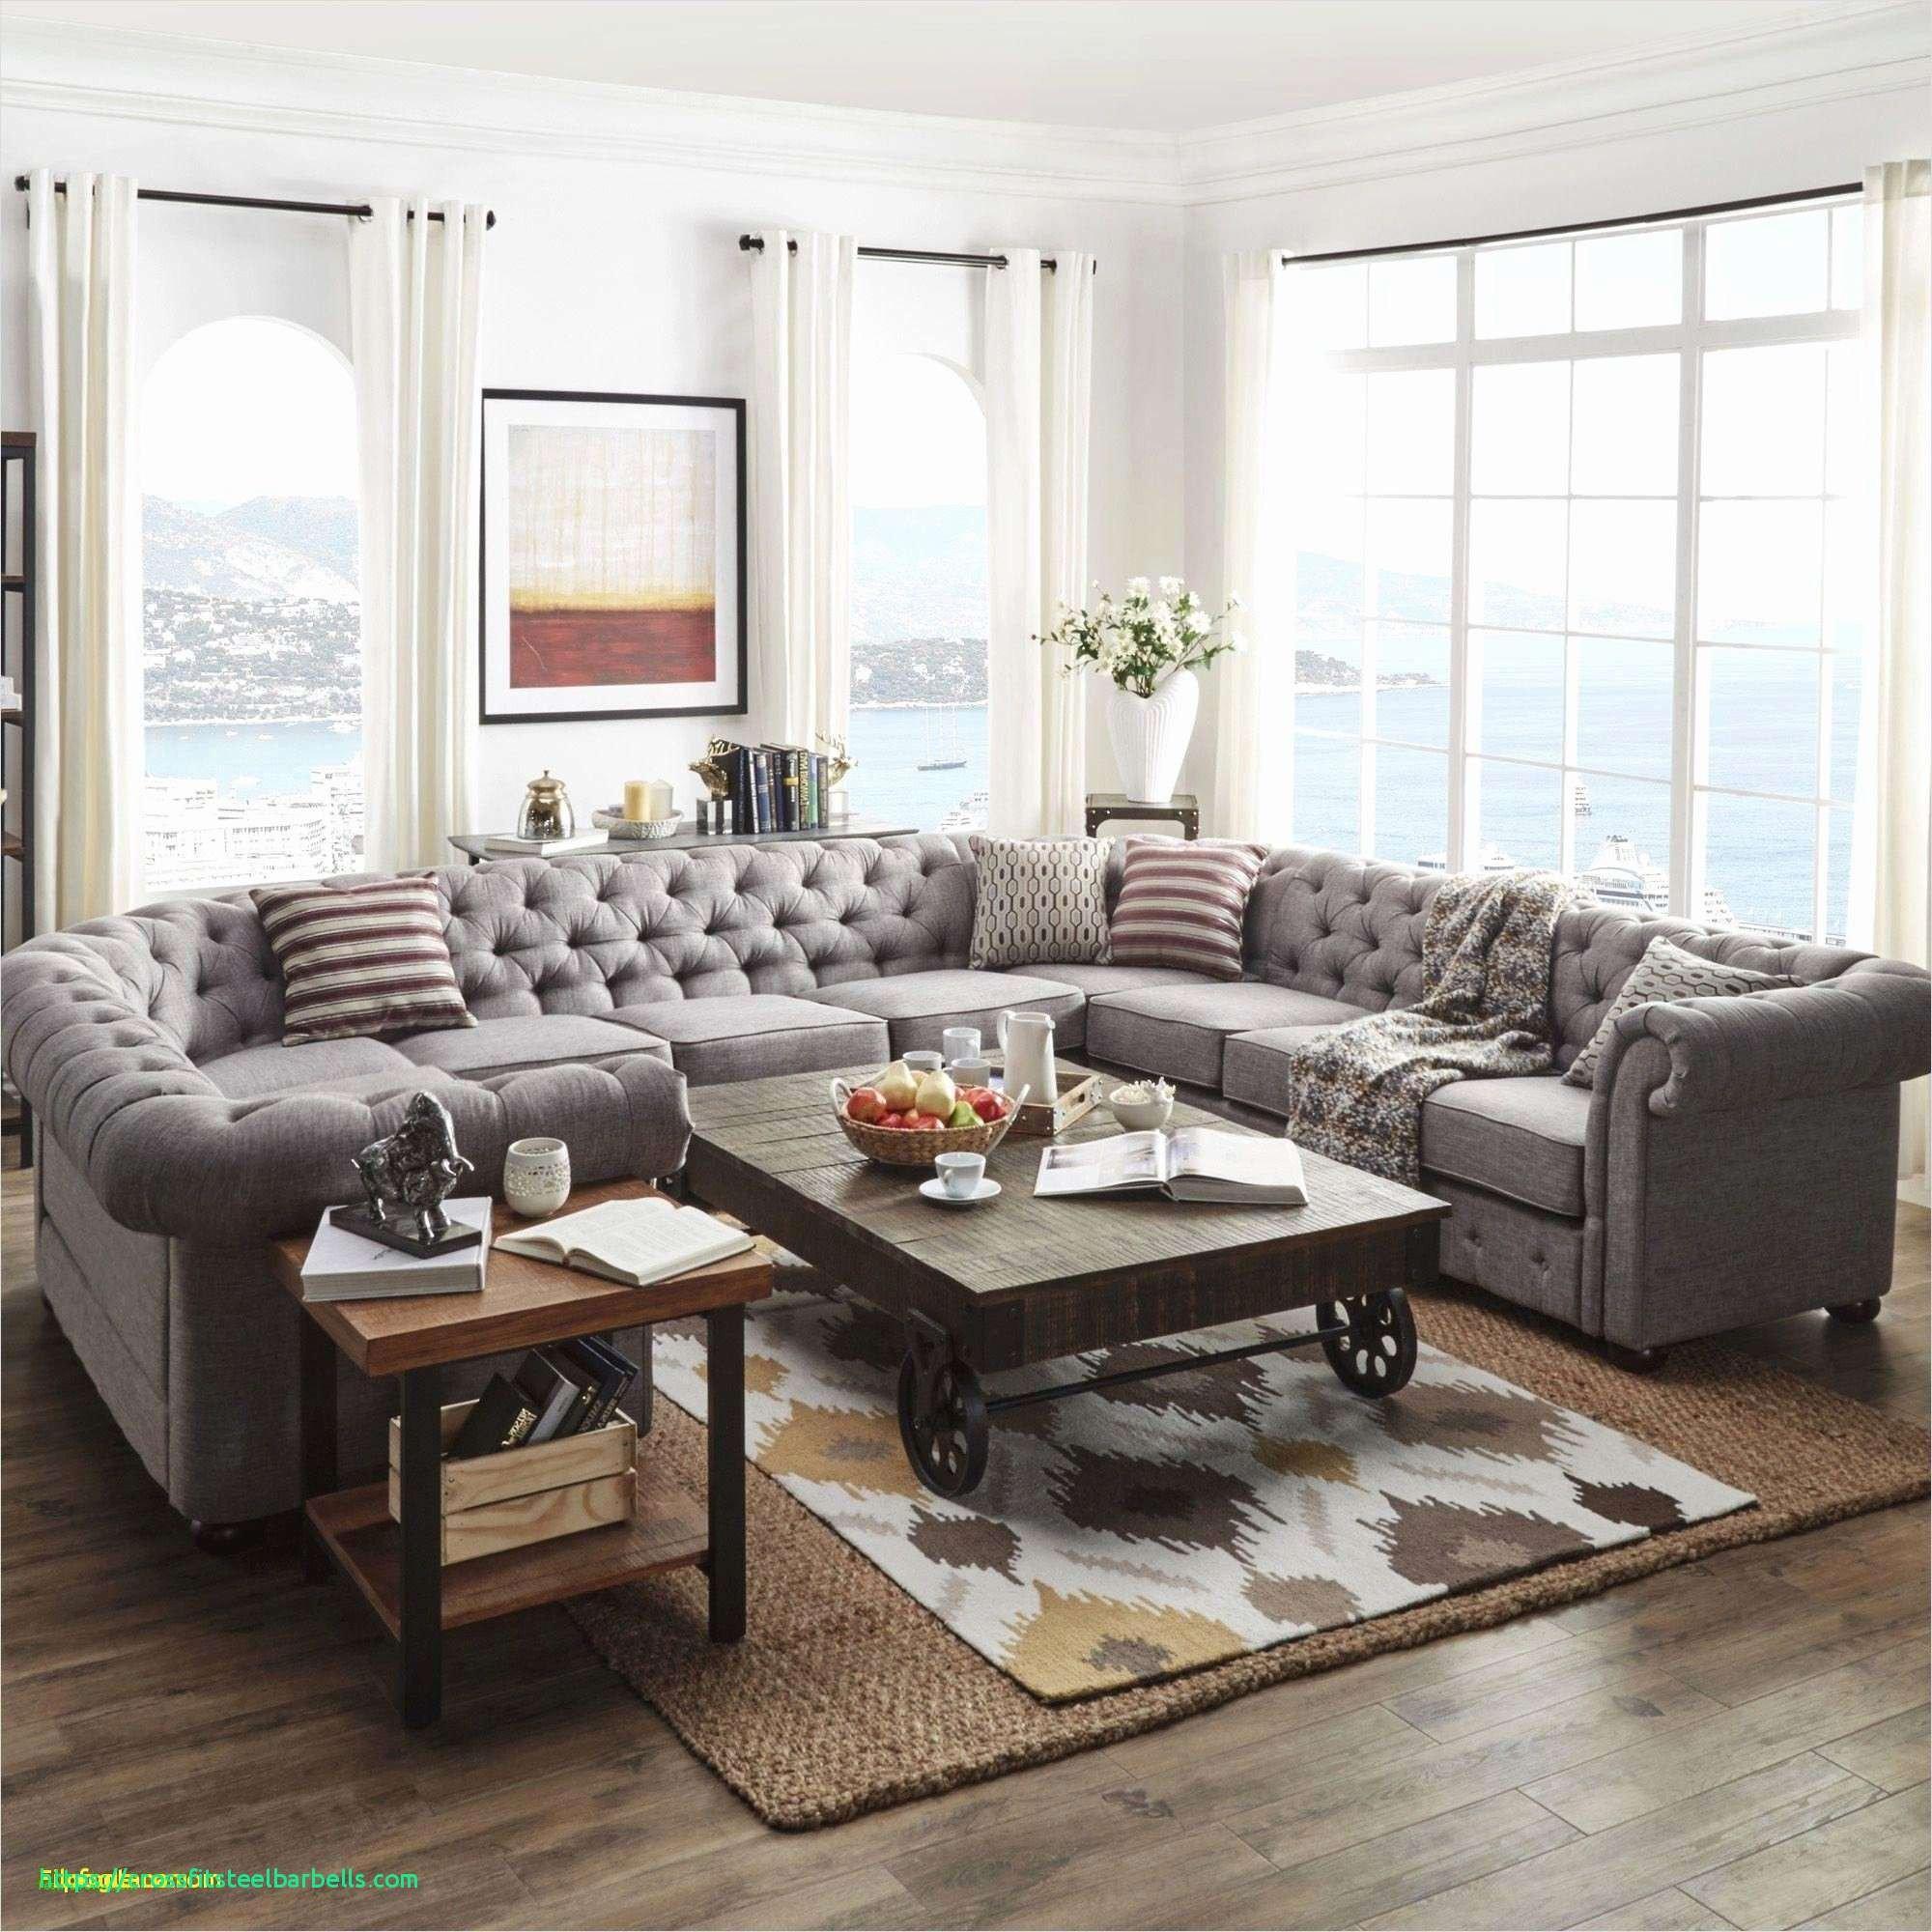 Dark Wood Floor Bedroom Luxury 21 Stunning Dark Hardwood Floors